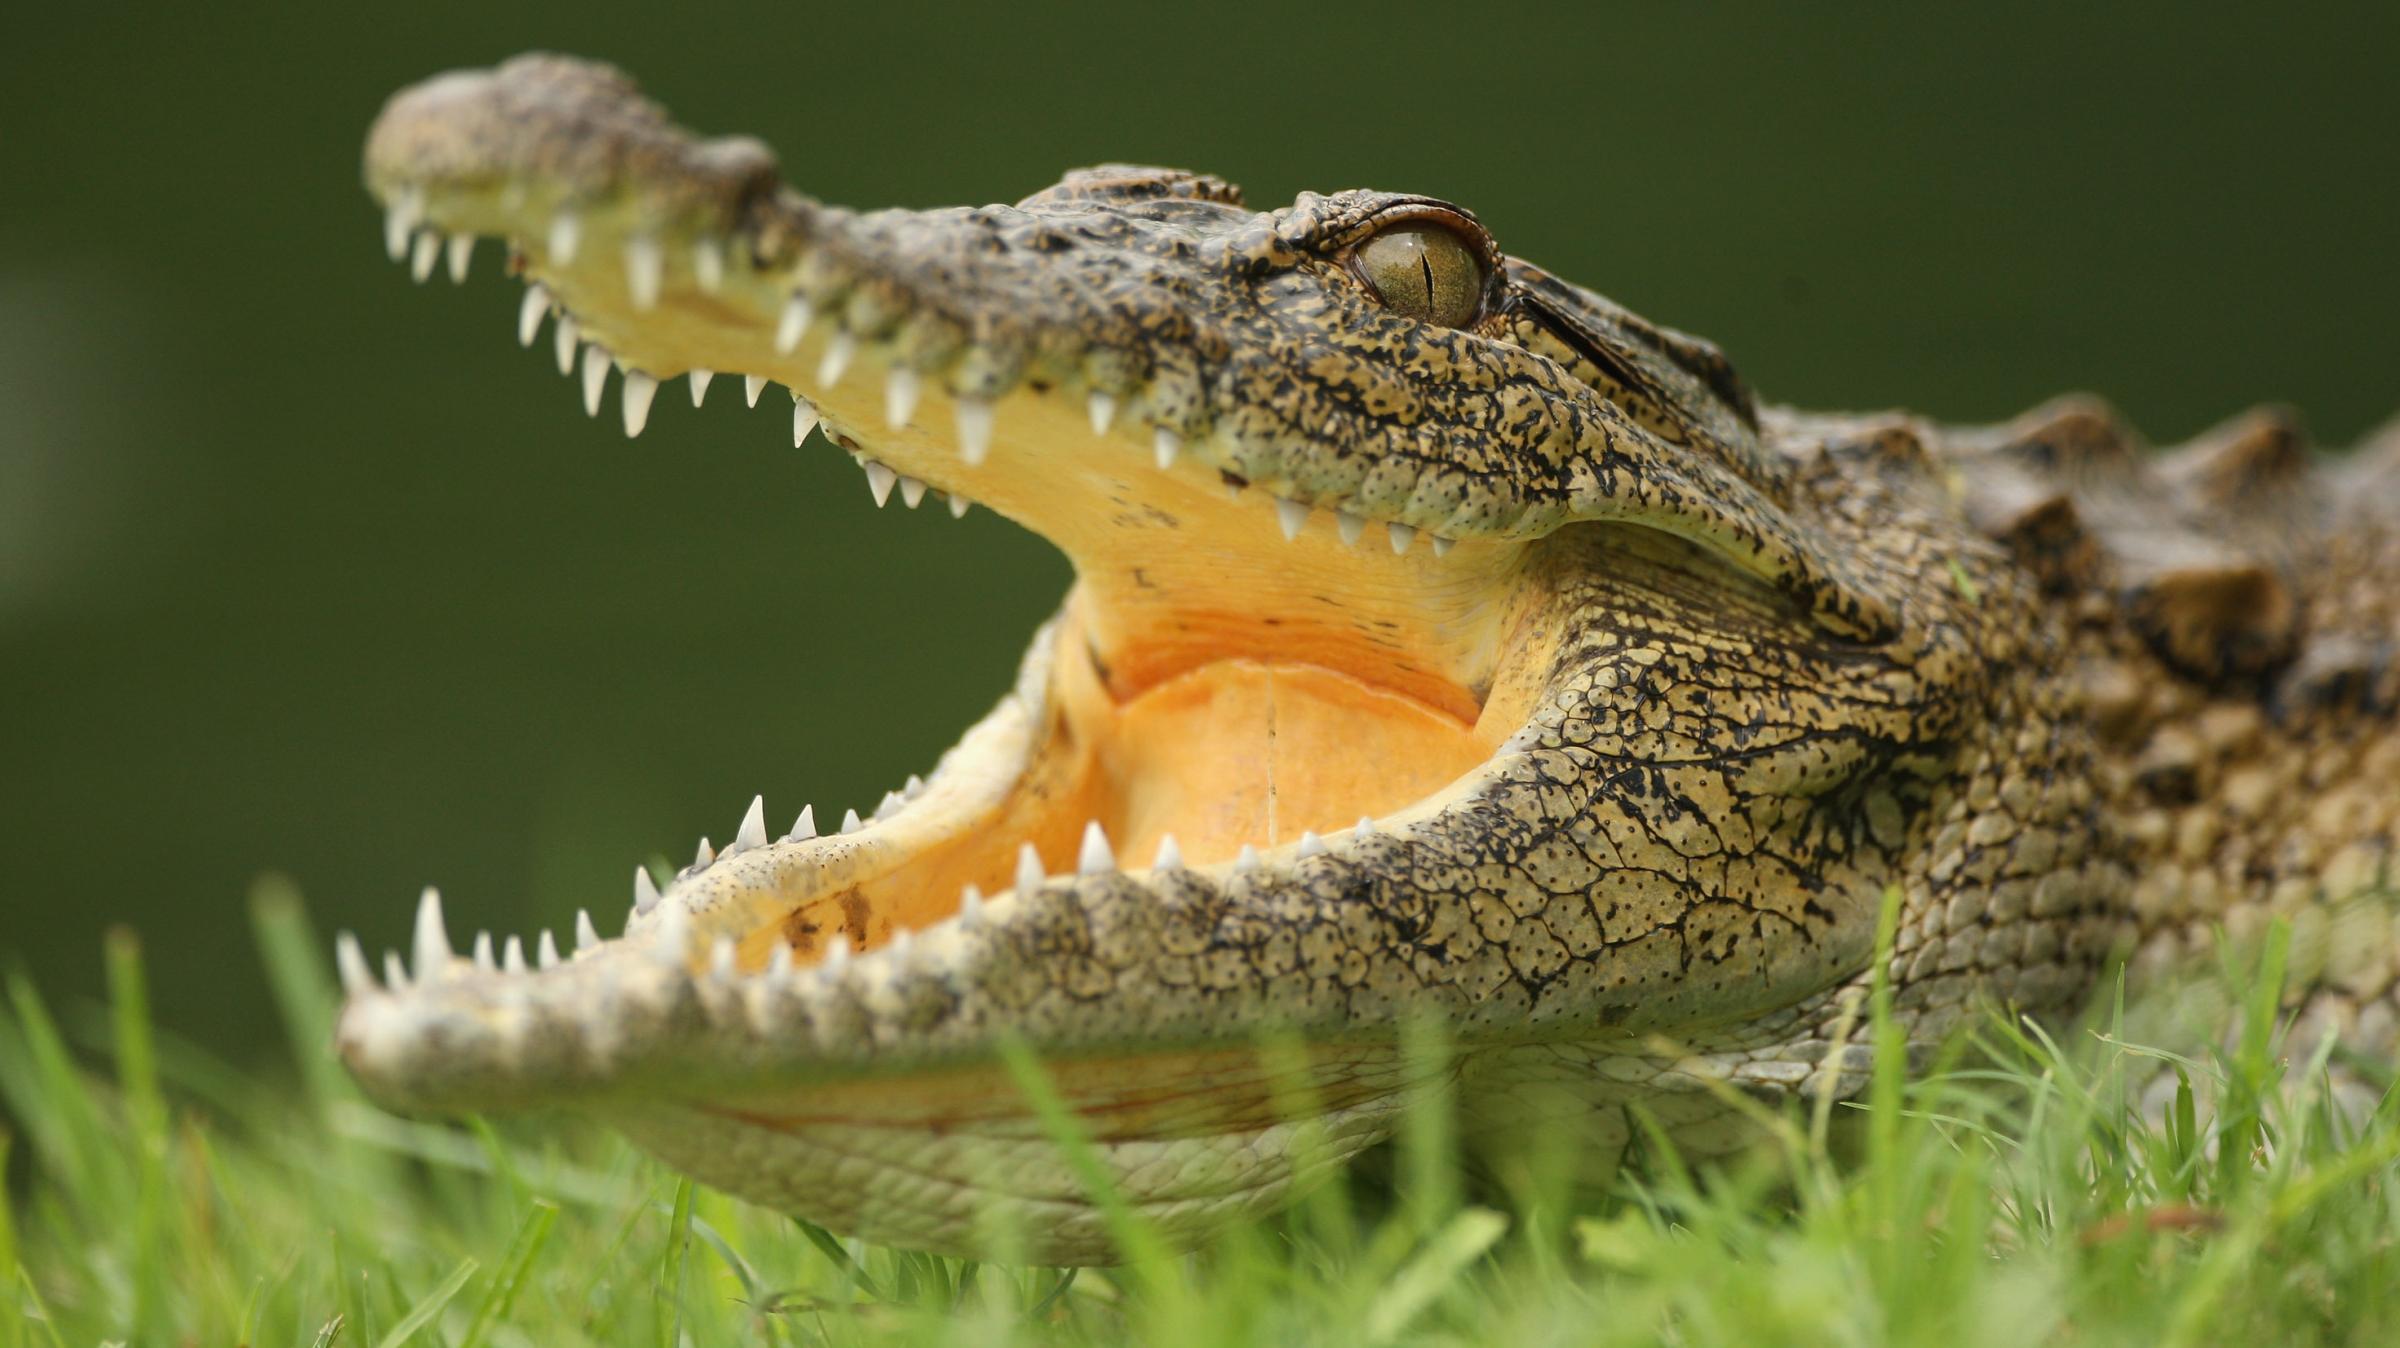 Yikes 15 000 Crocodiles Escape Farm In South Africa Area